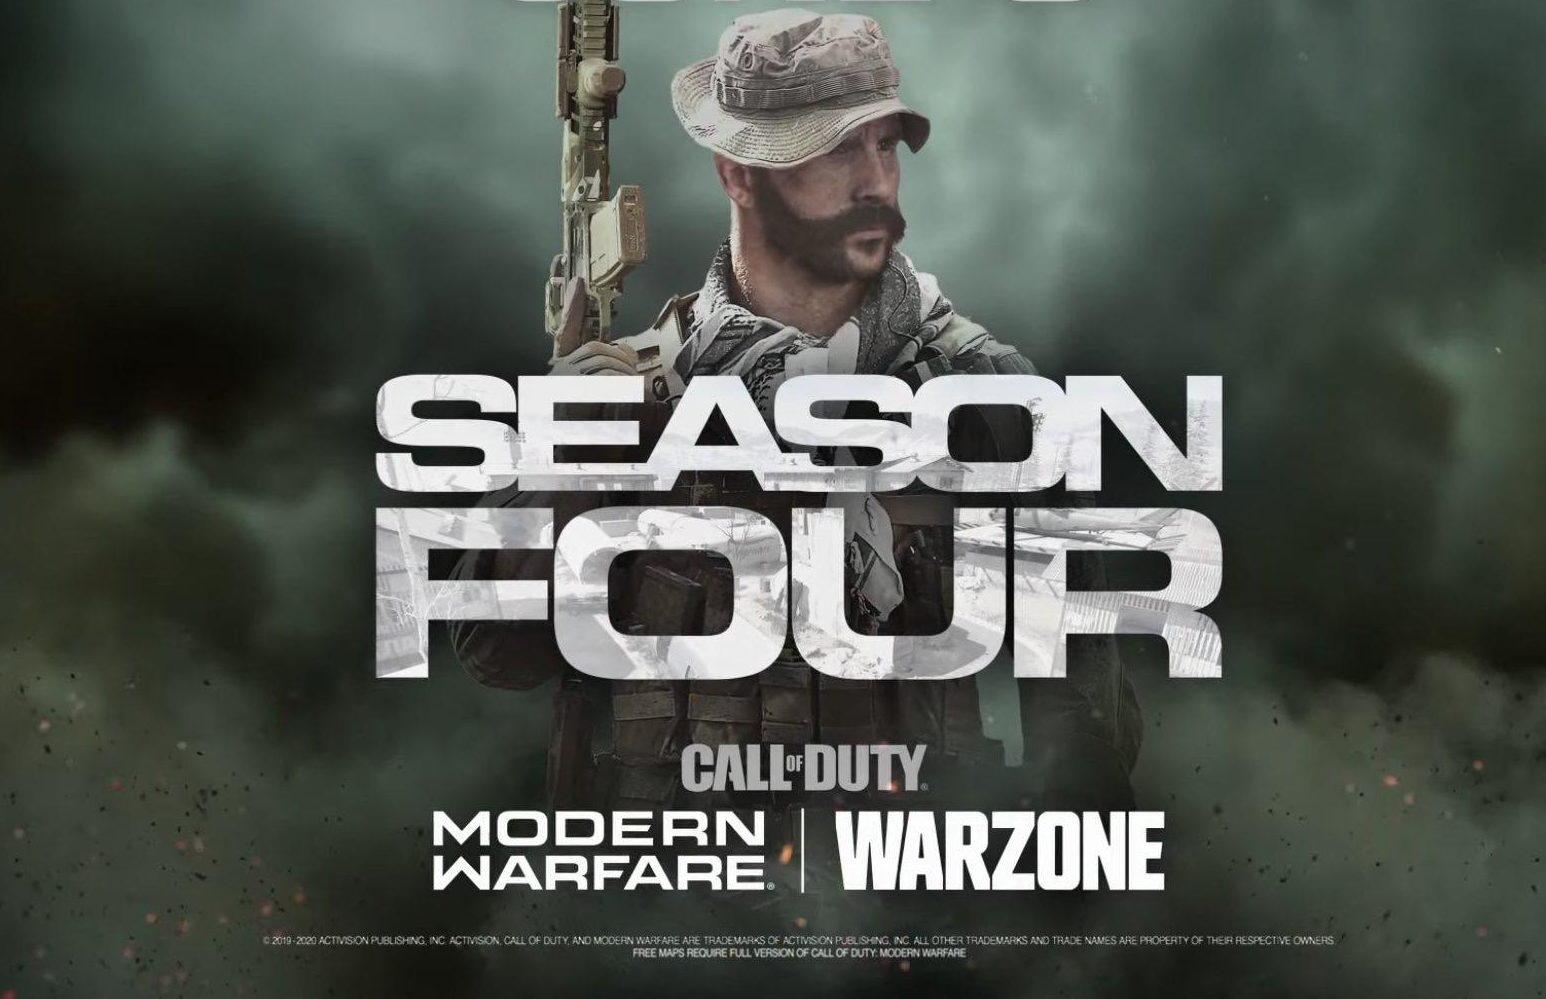 warzone season 4 temporada 4